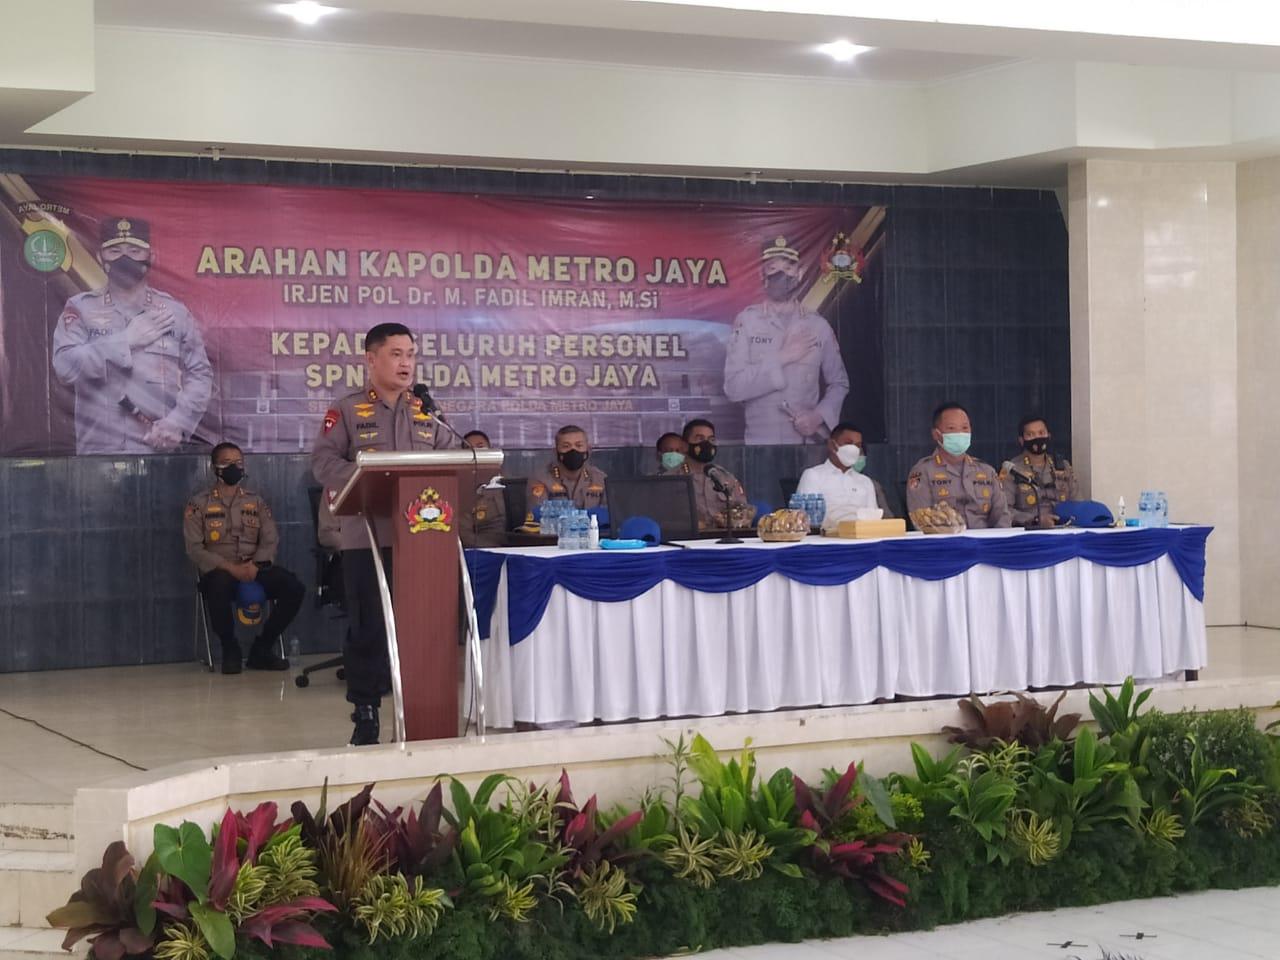 Arahan Kapolda ke anggota SPN Lido